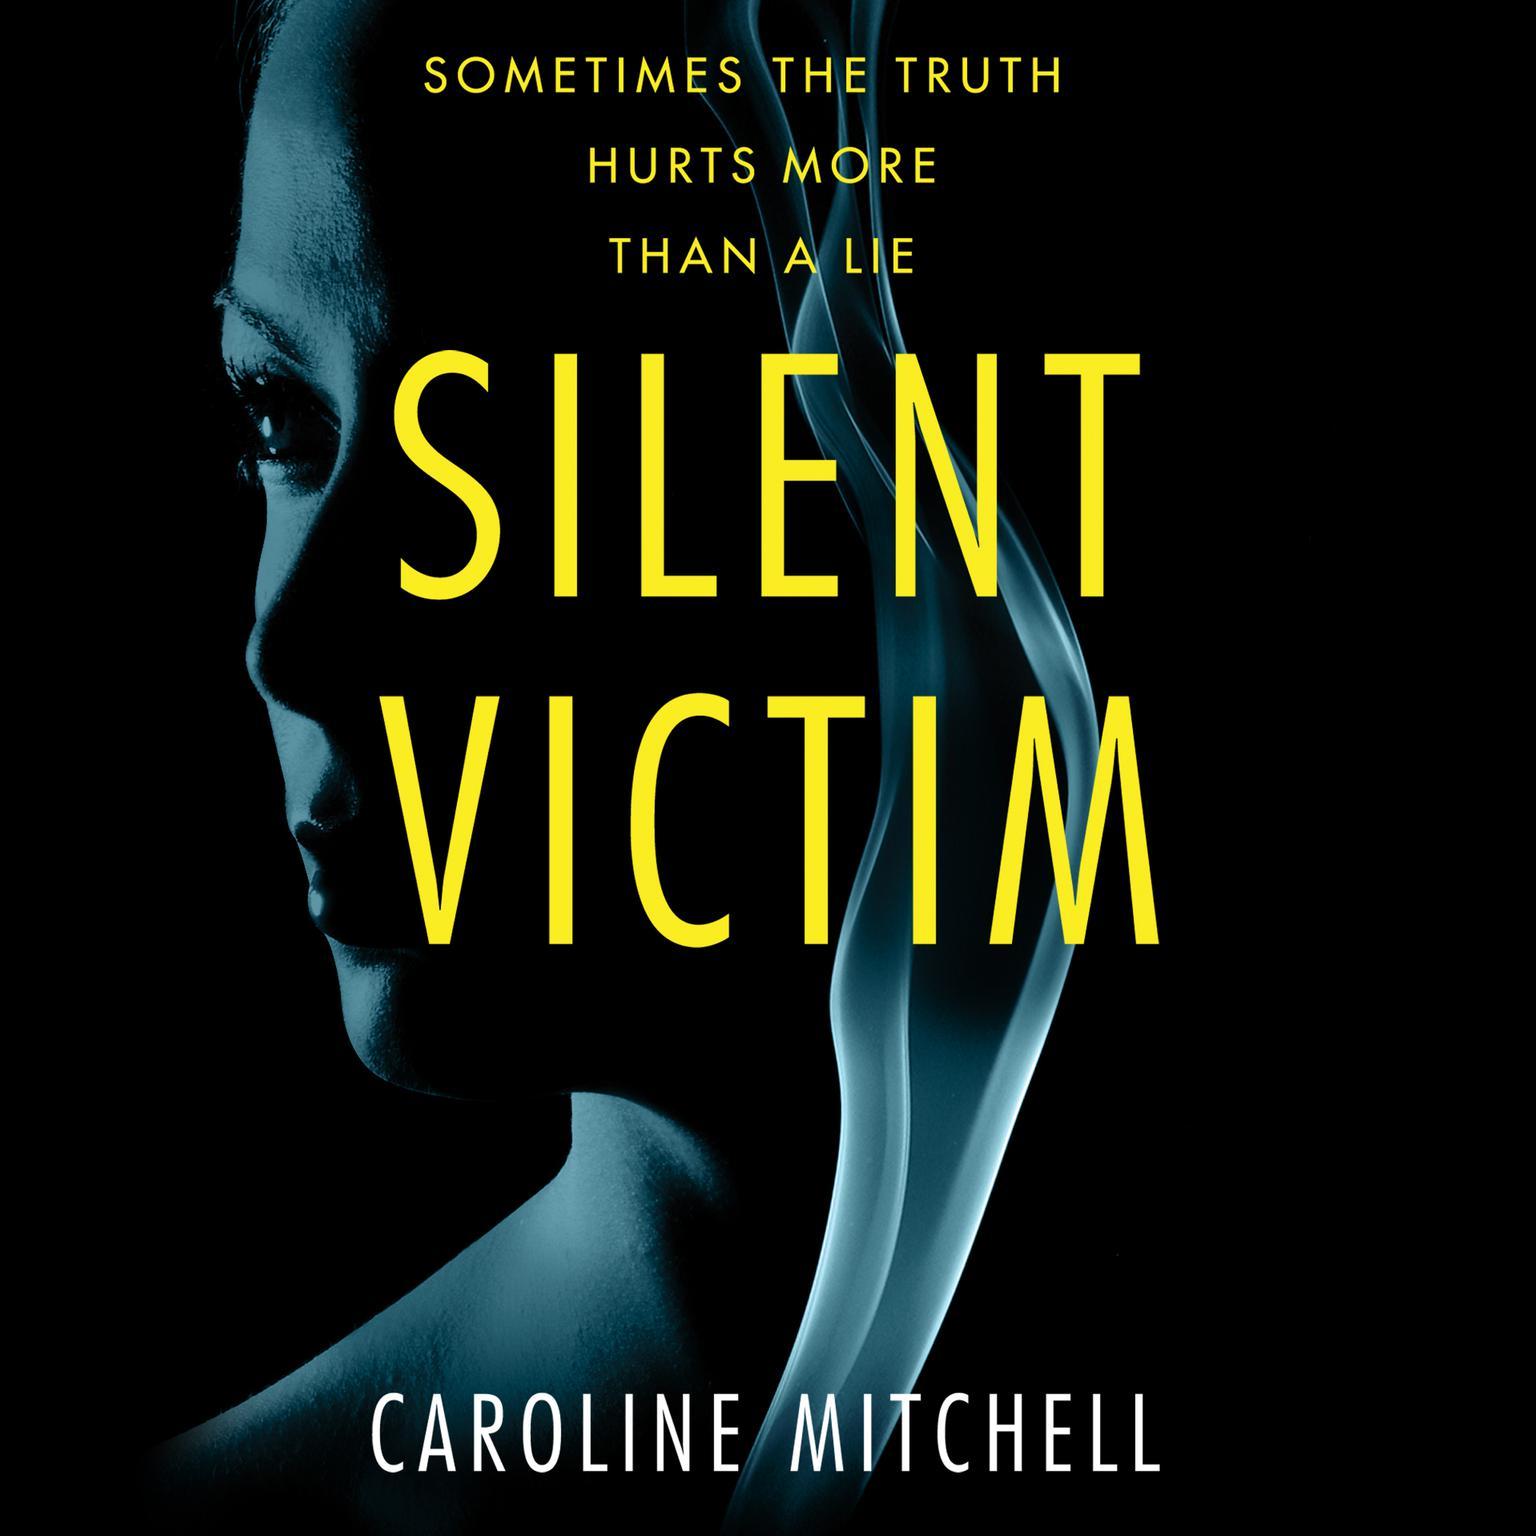 Silent Victim Audiobook, by Caroline Mitchell